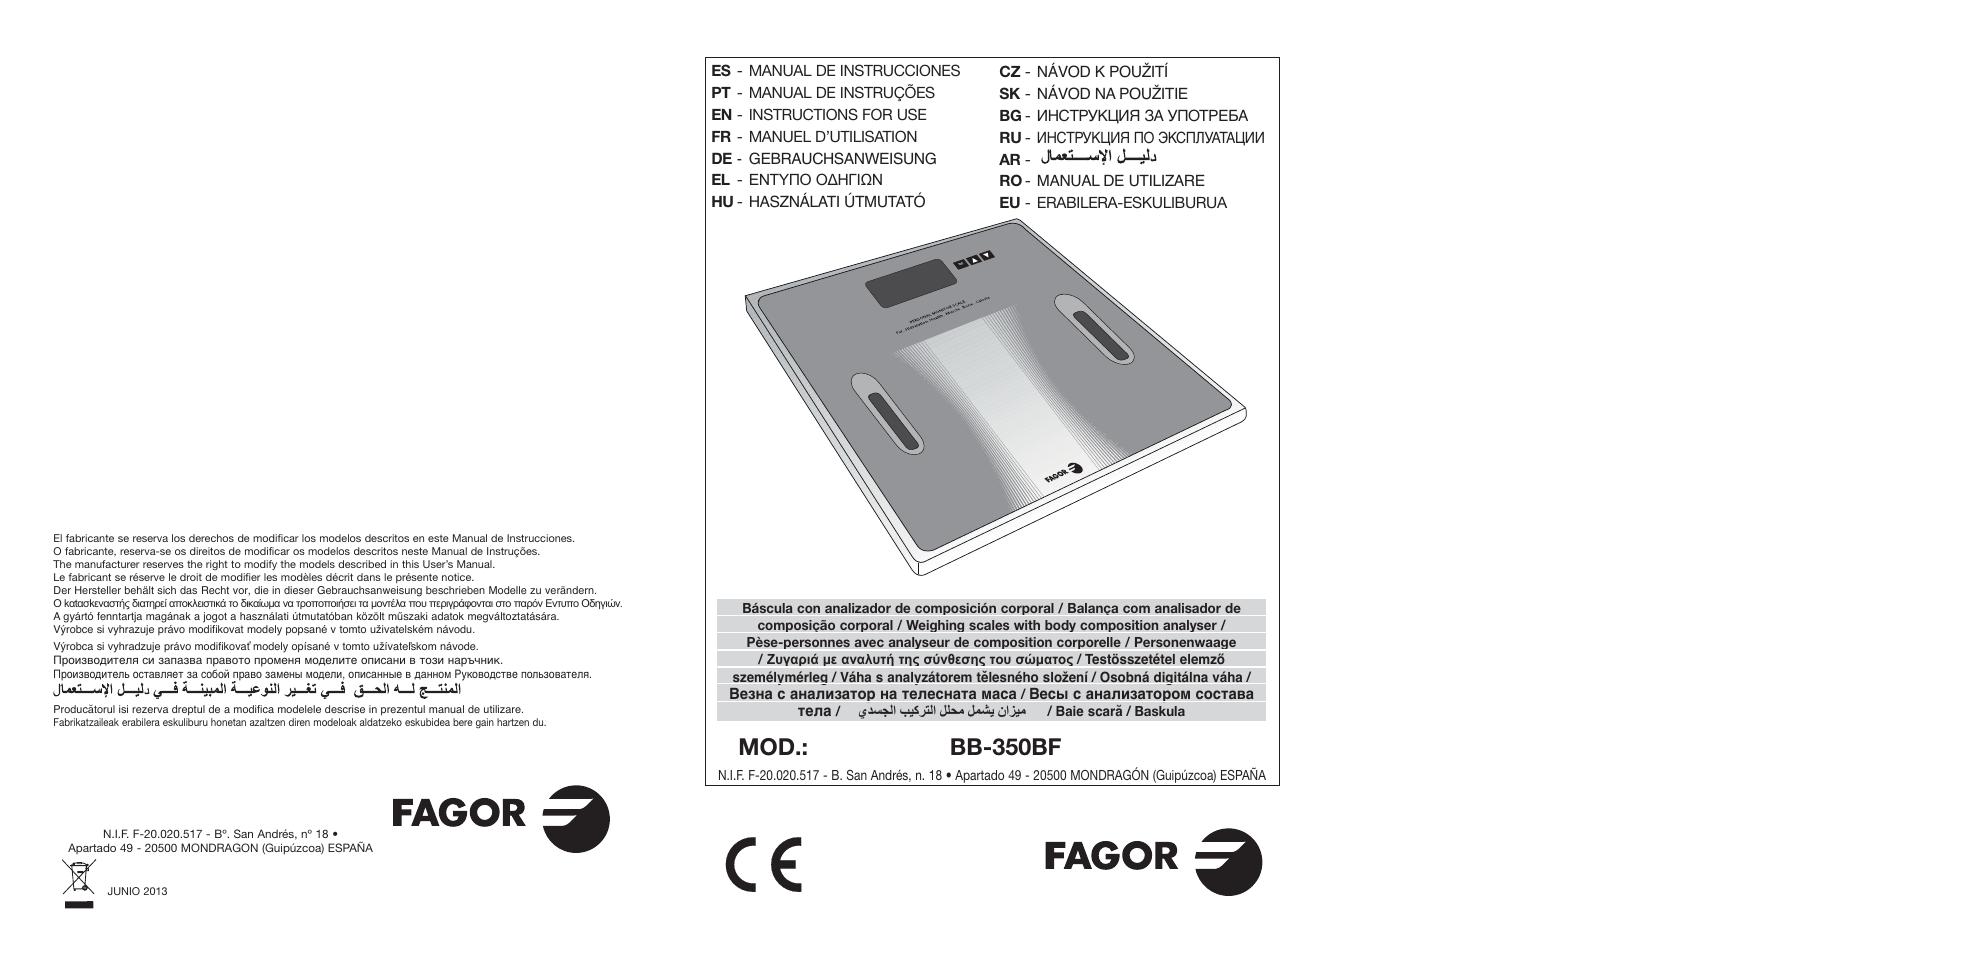 Sony Icd Ux70 Manual Pdf Ebook Necchi 4795 Sewing Machine Threading Diagram Array Blackberry Utilizare Rh Thepeoplestrust Co Uk